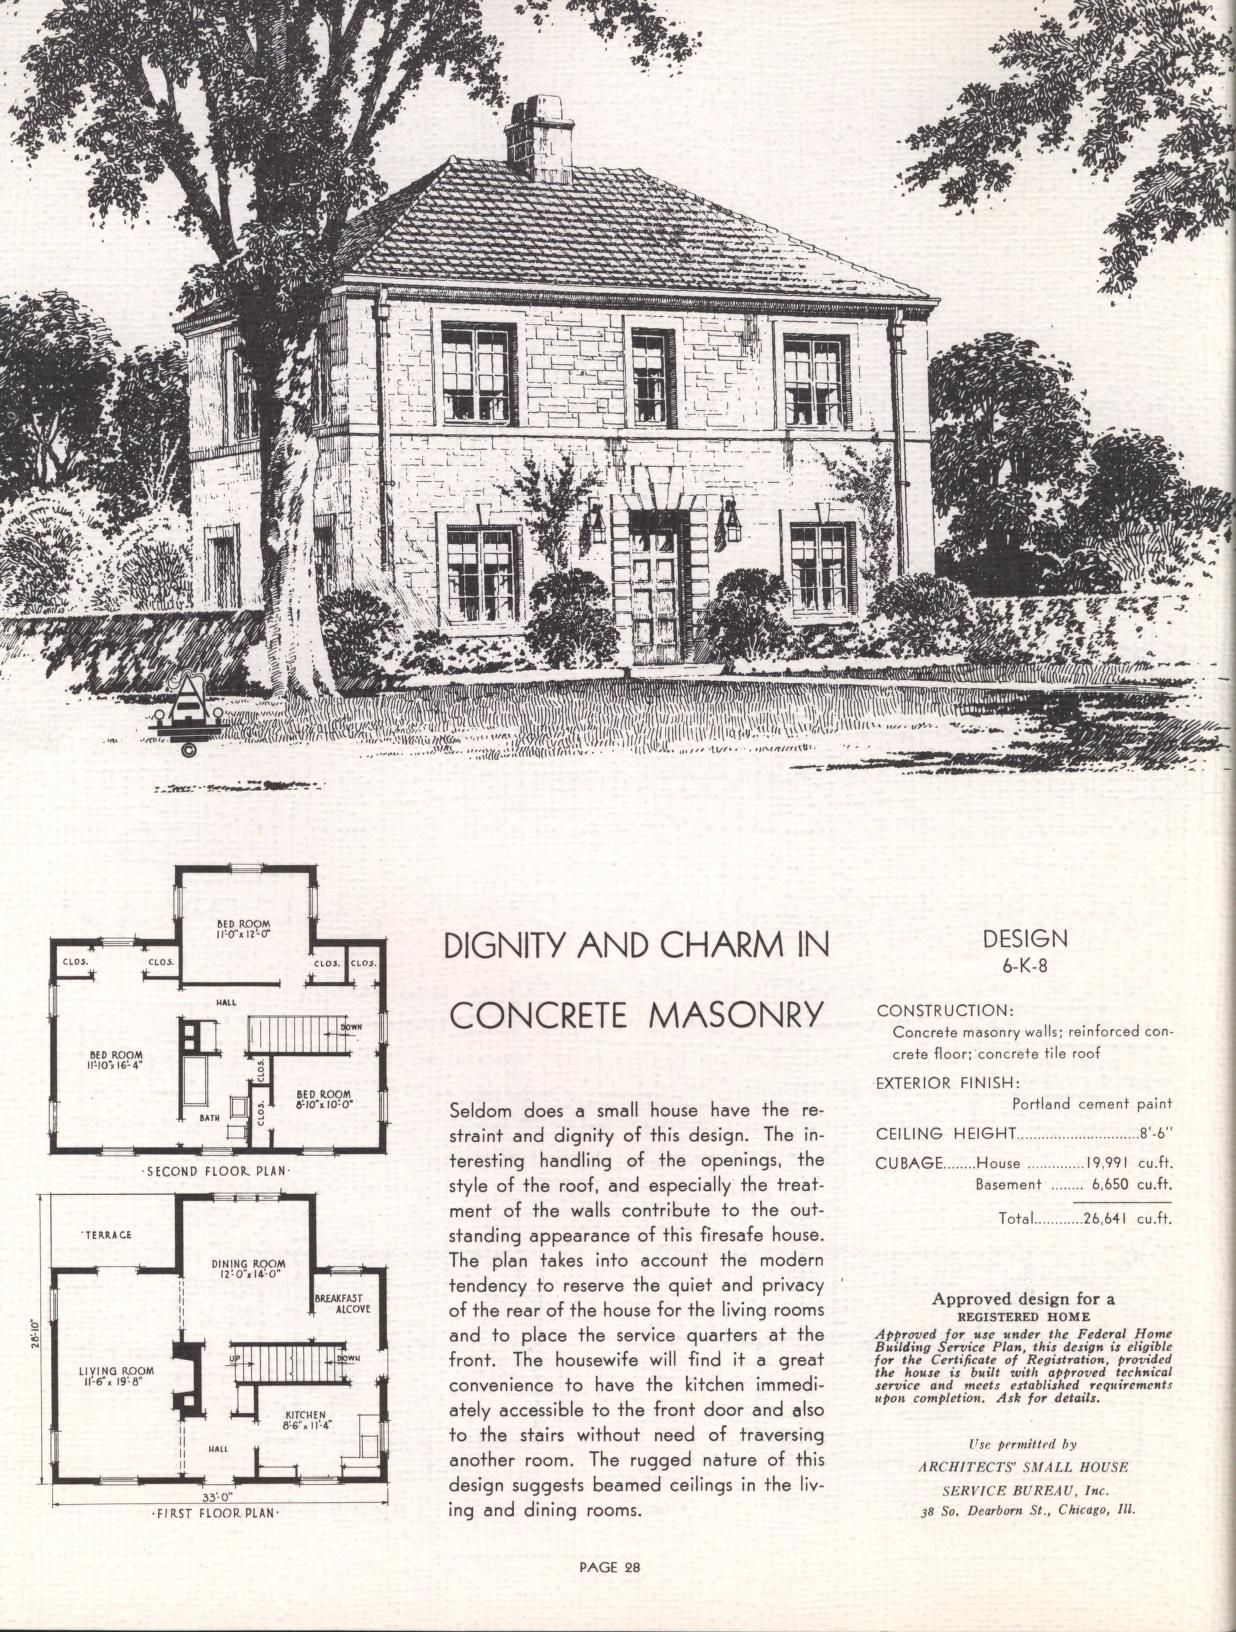 1909 Radford Cement Homes No 8254 House Plans Tiny House Floor Plans Vintage House Plans